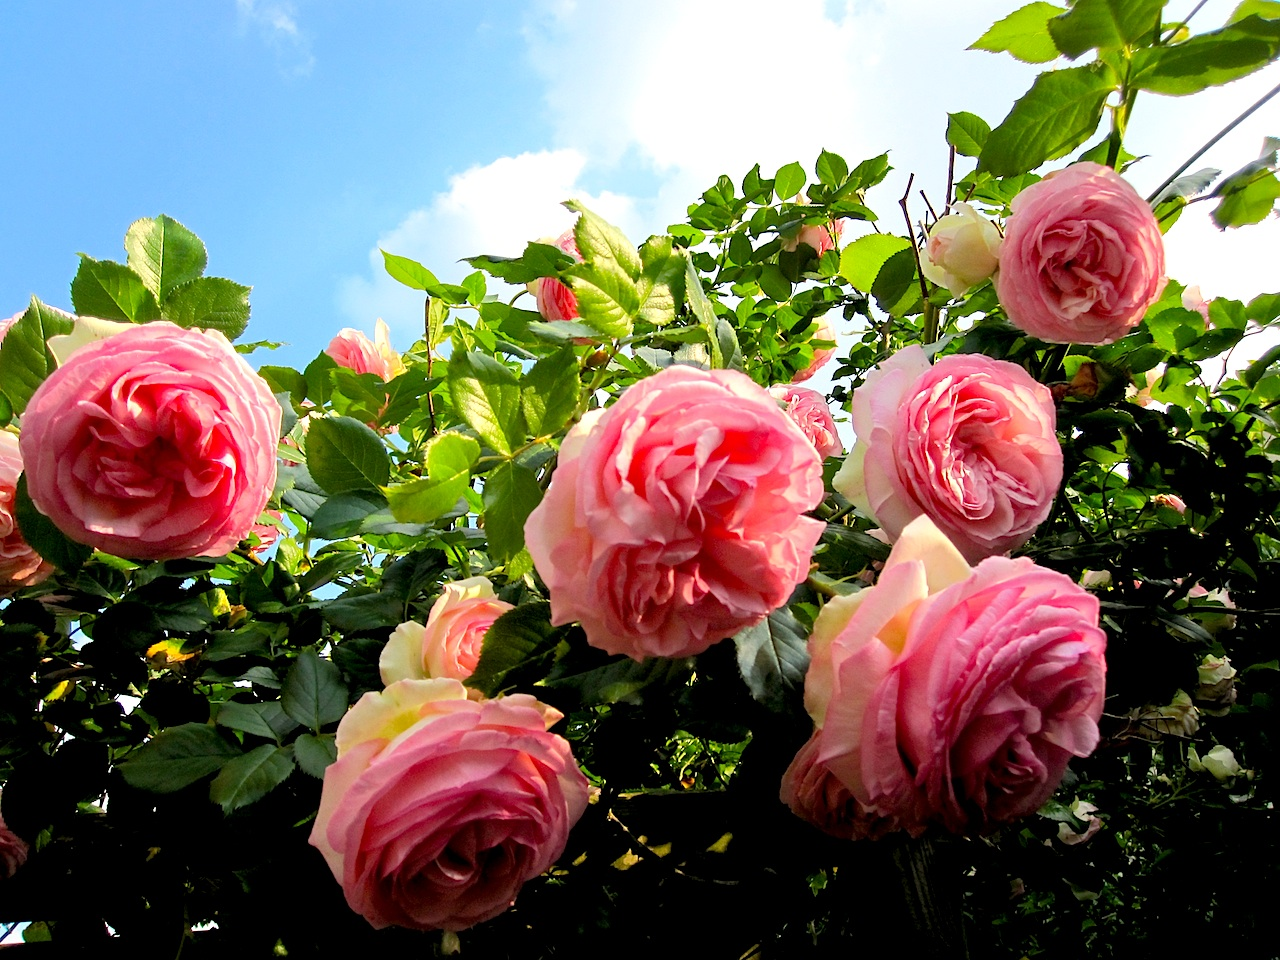 rose2010-1.jpg